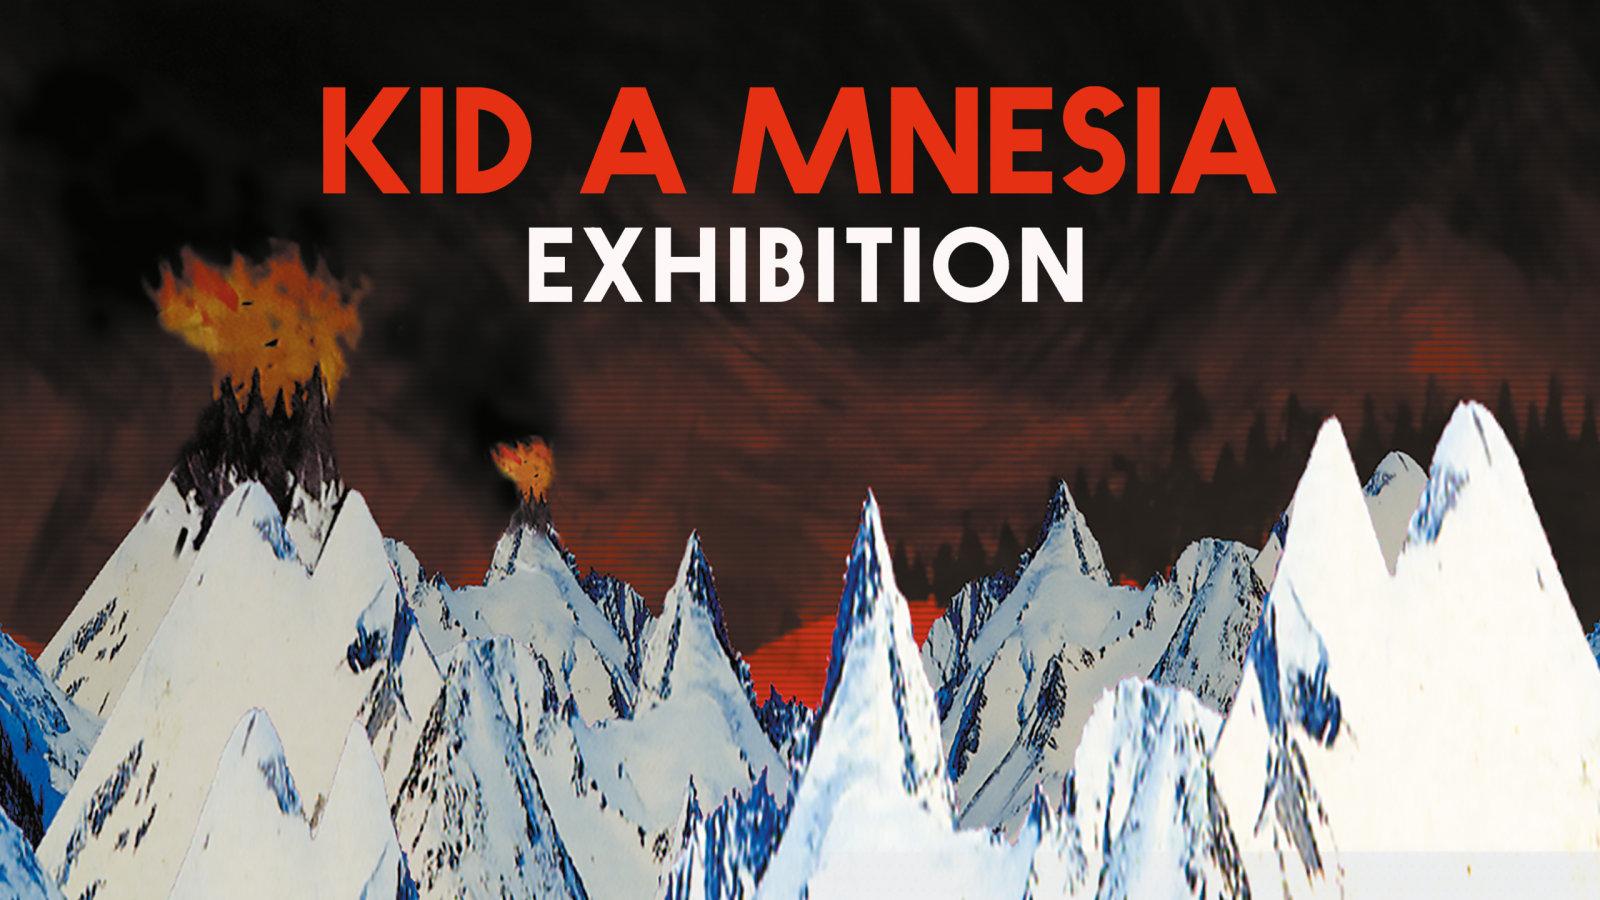 Radiohead 和 Epic Games 合作的新项目 《Kid A Mnesia Exhibition》首次公开